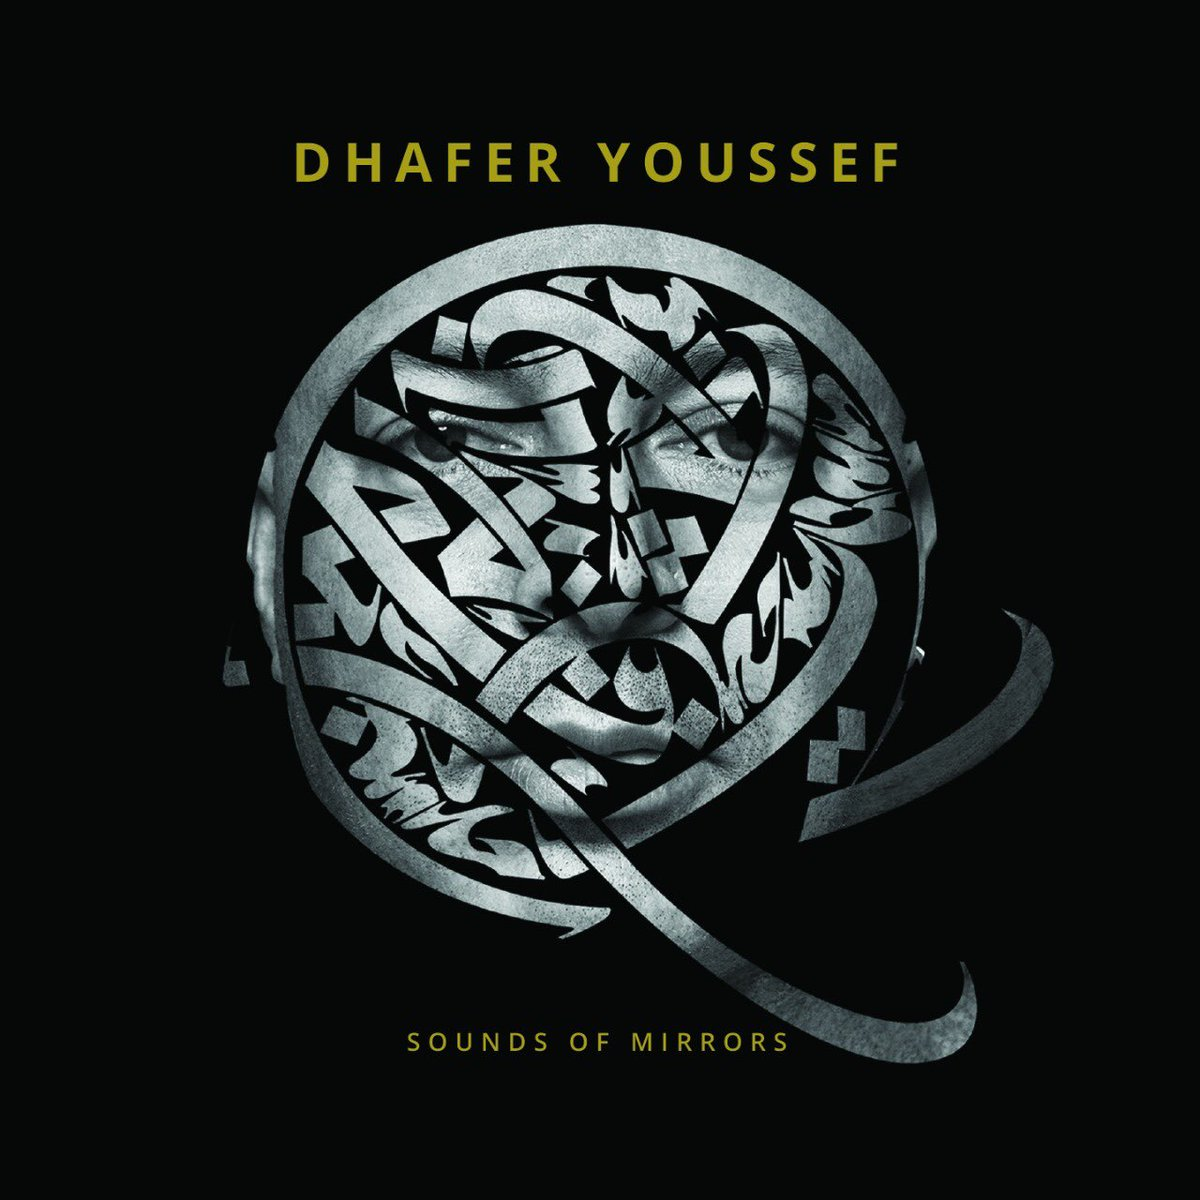 Dhafer Youssef Dhaferyoussef Twitter